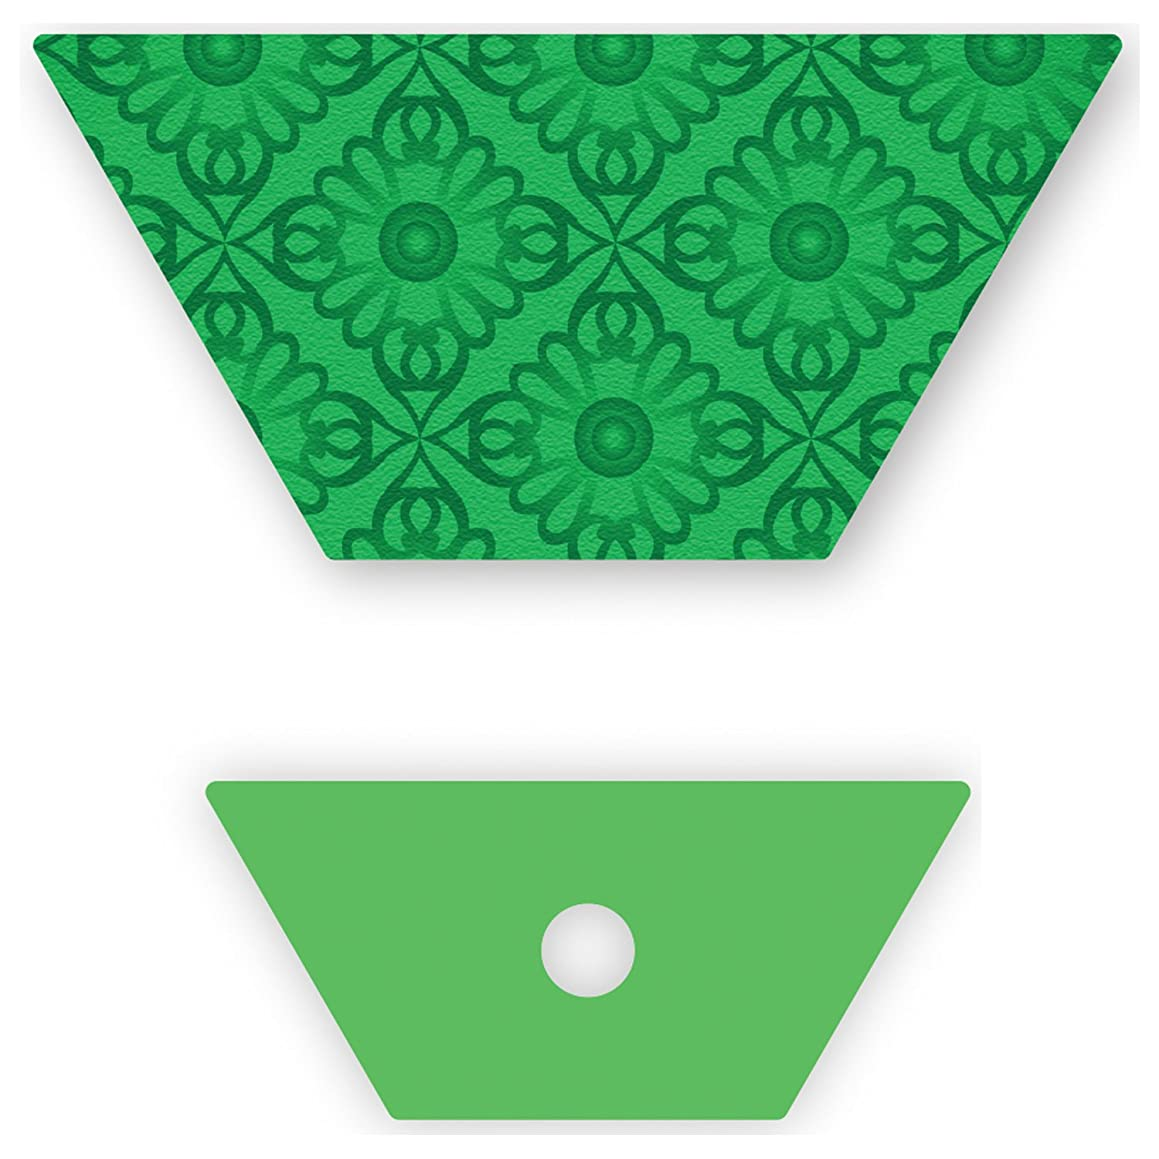 Crafter's Edge Q1052 English Paper Piecing Half Hexagon